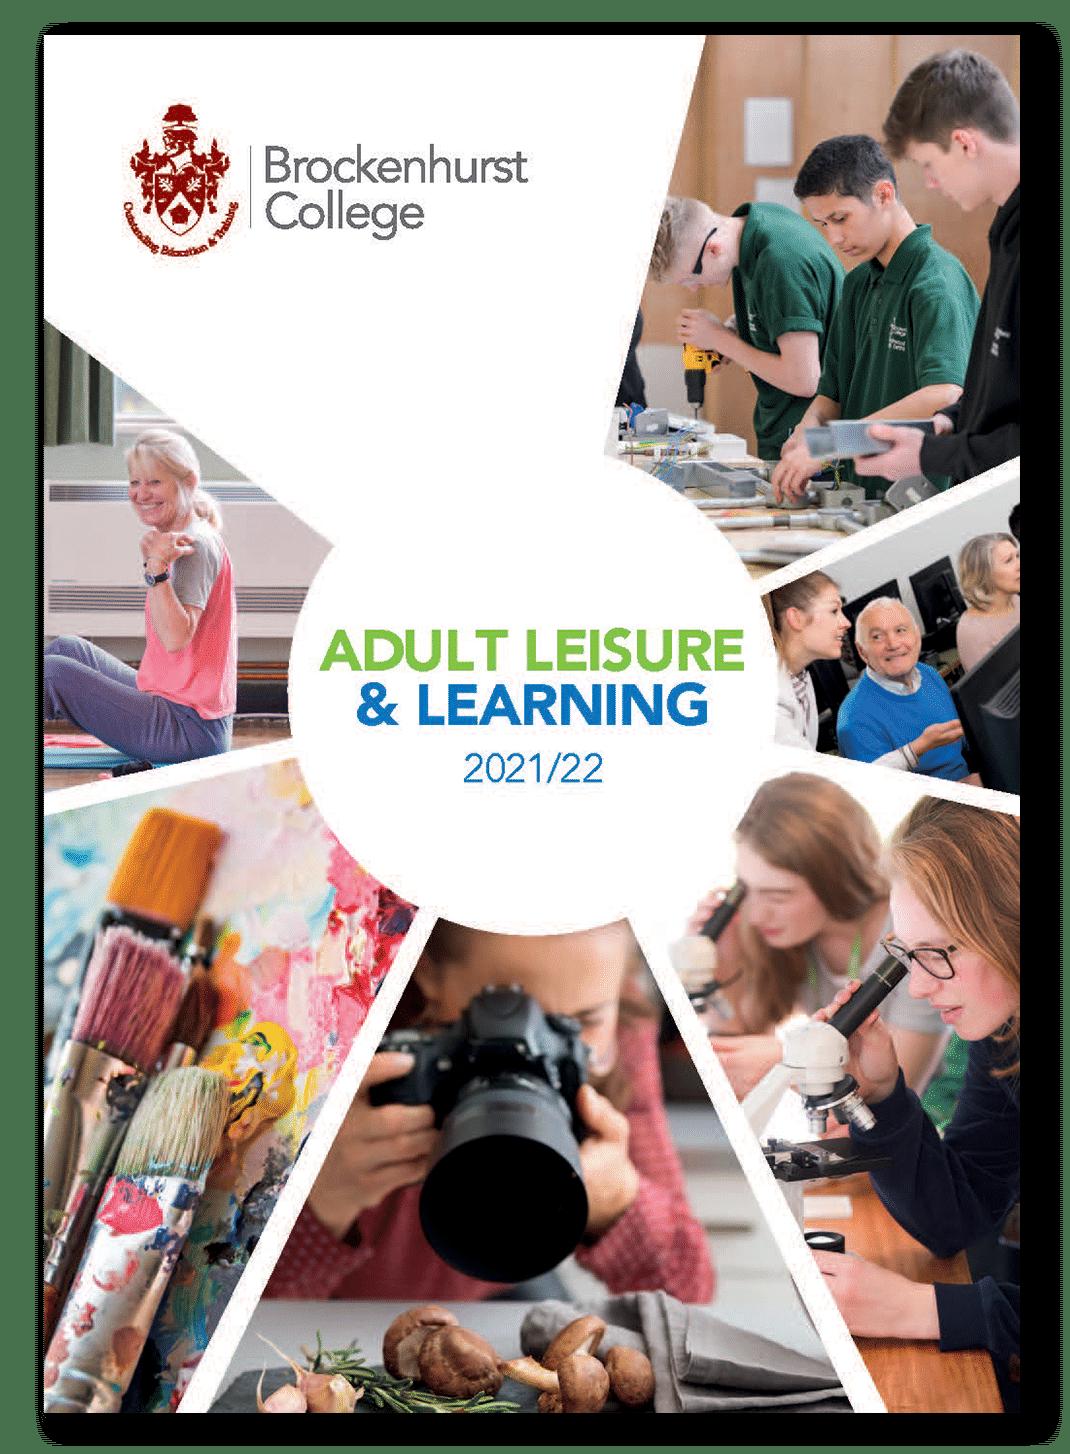 Adult Leisure & Learning Brochure 2021/22